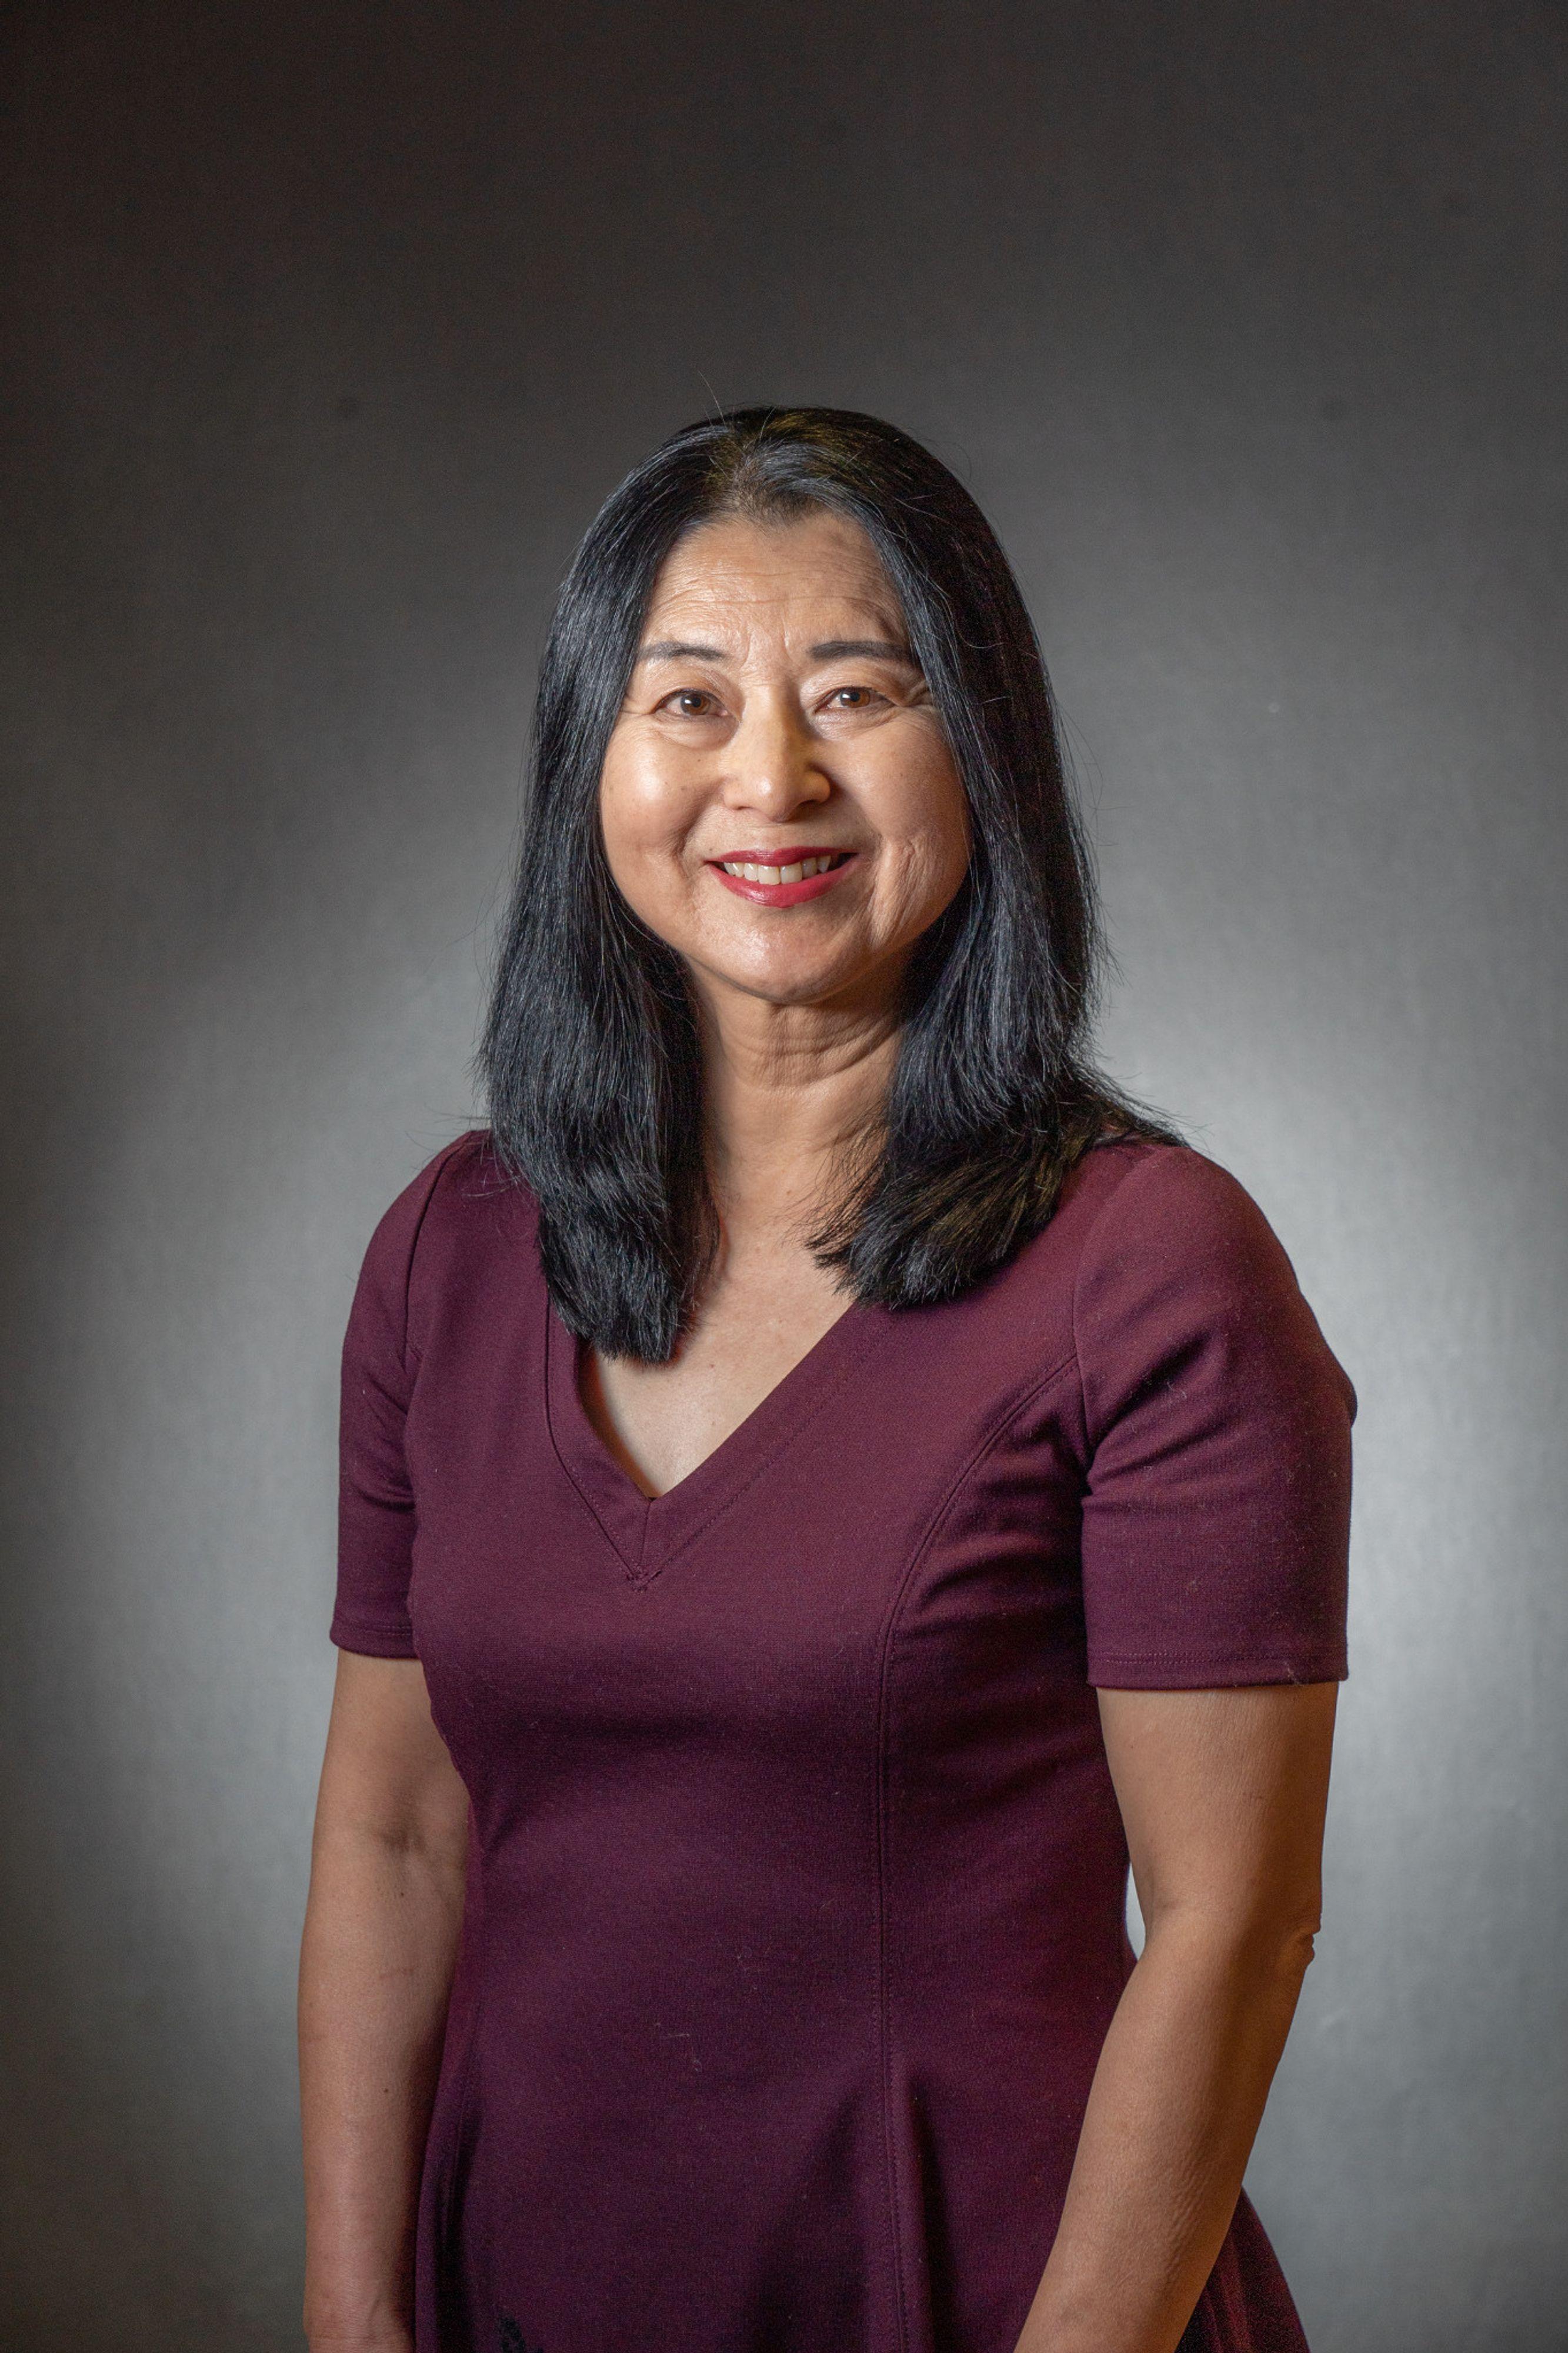 Mayumi Zbaeren